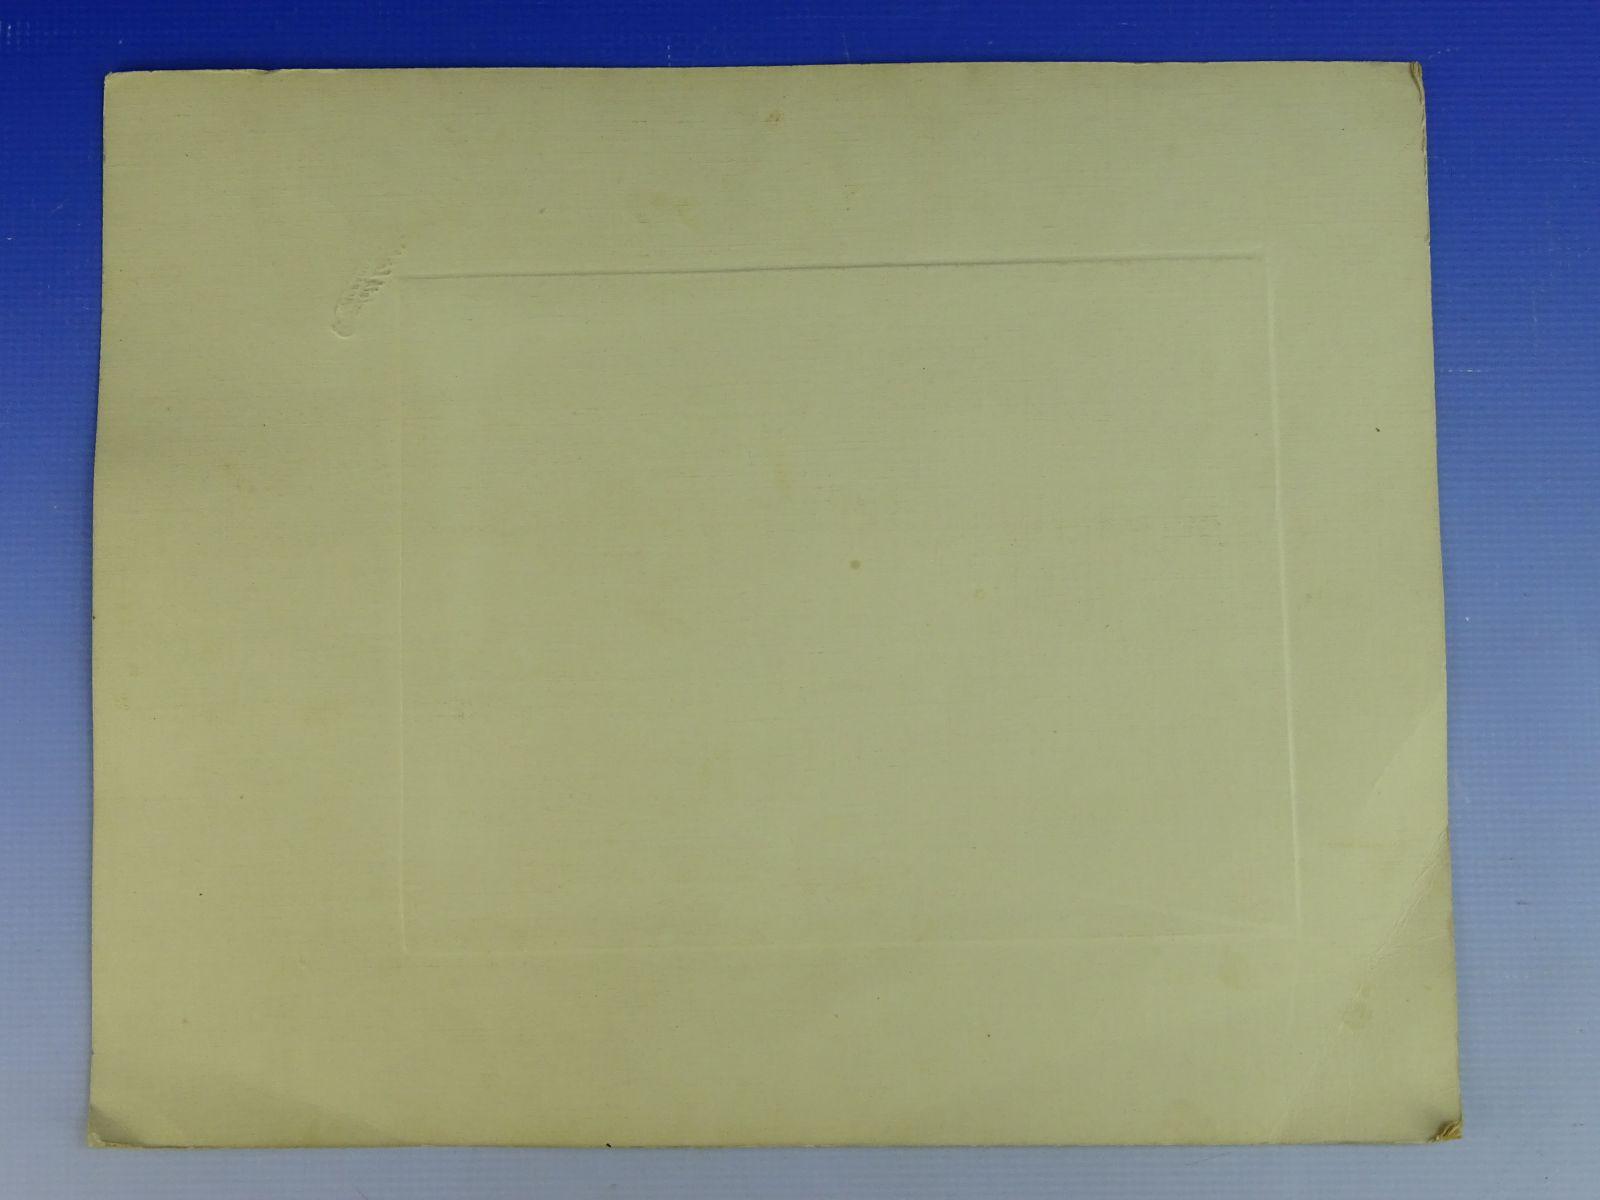 DSC00784.JPG (1600×1200)